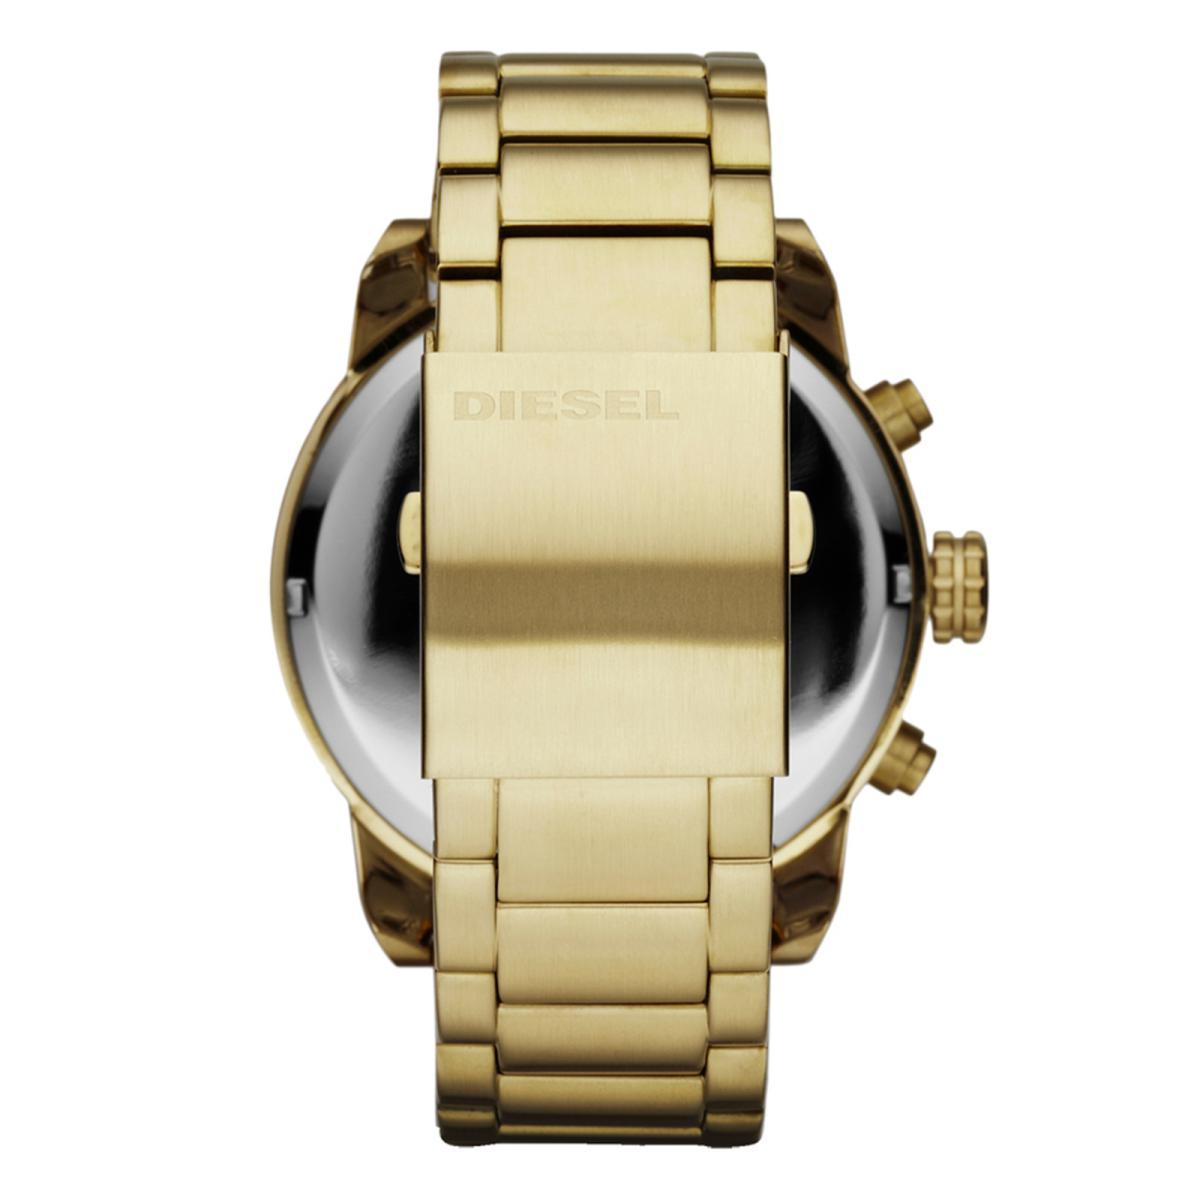 61ba64b73e0c Reloj Diesel - DZ4268 - Hombre - Time Square